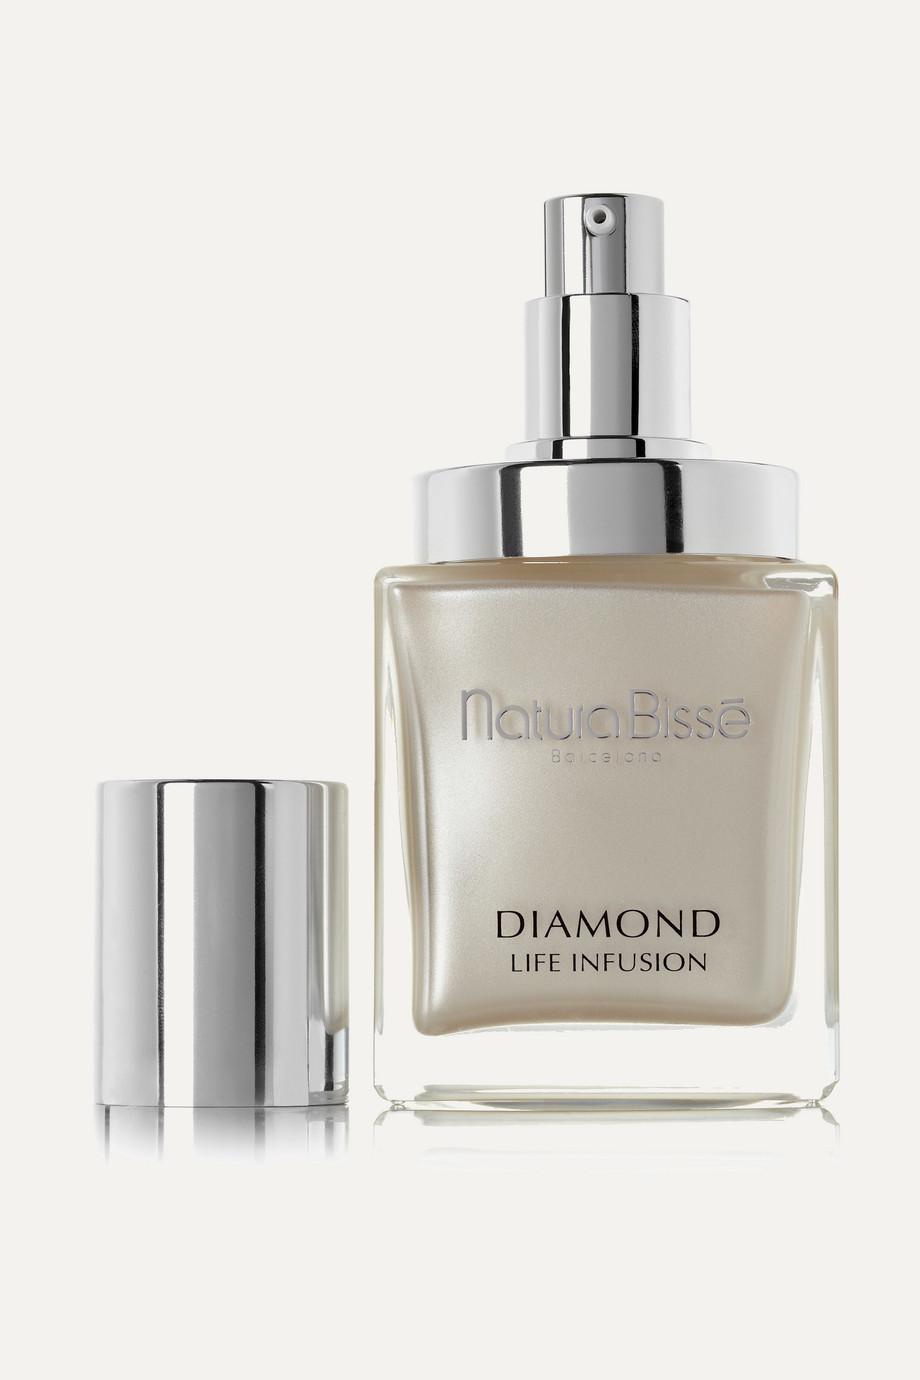 Natura Bissé Diamond Life Infusion, 25ml